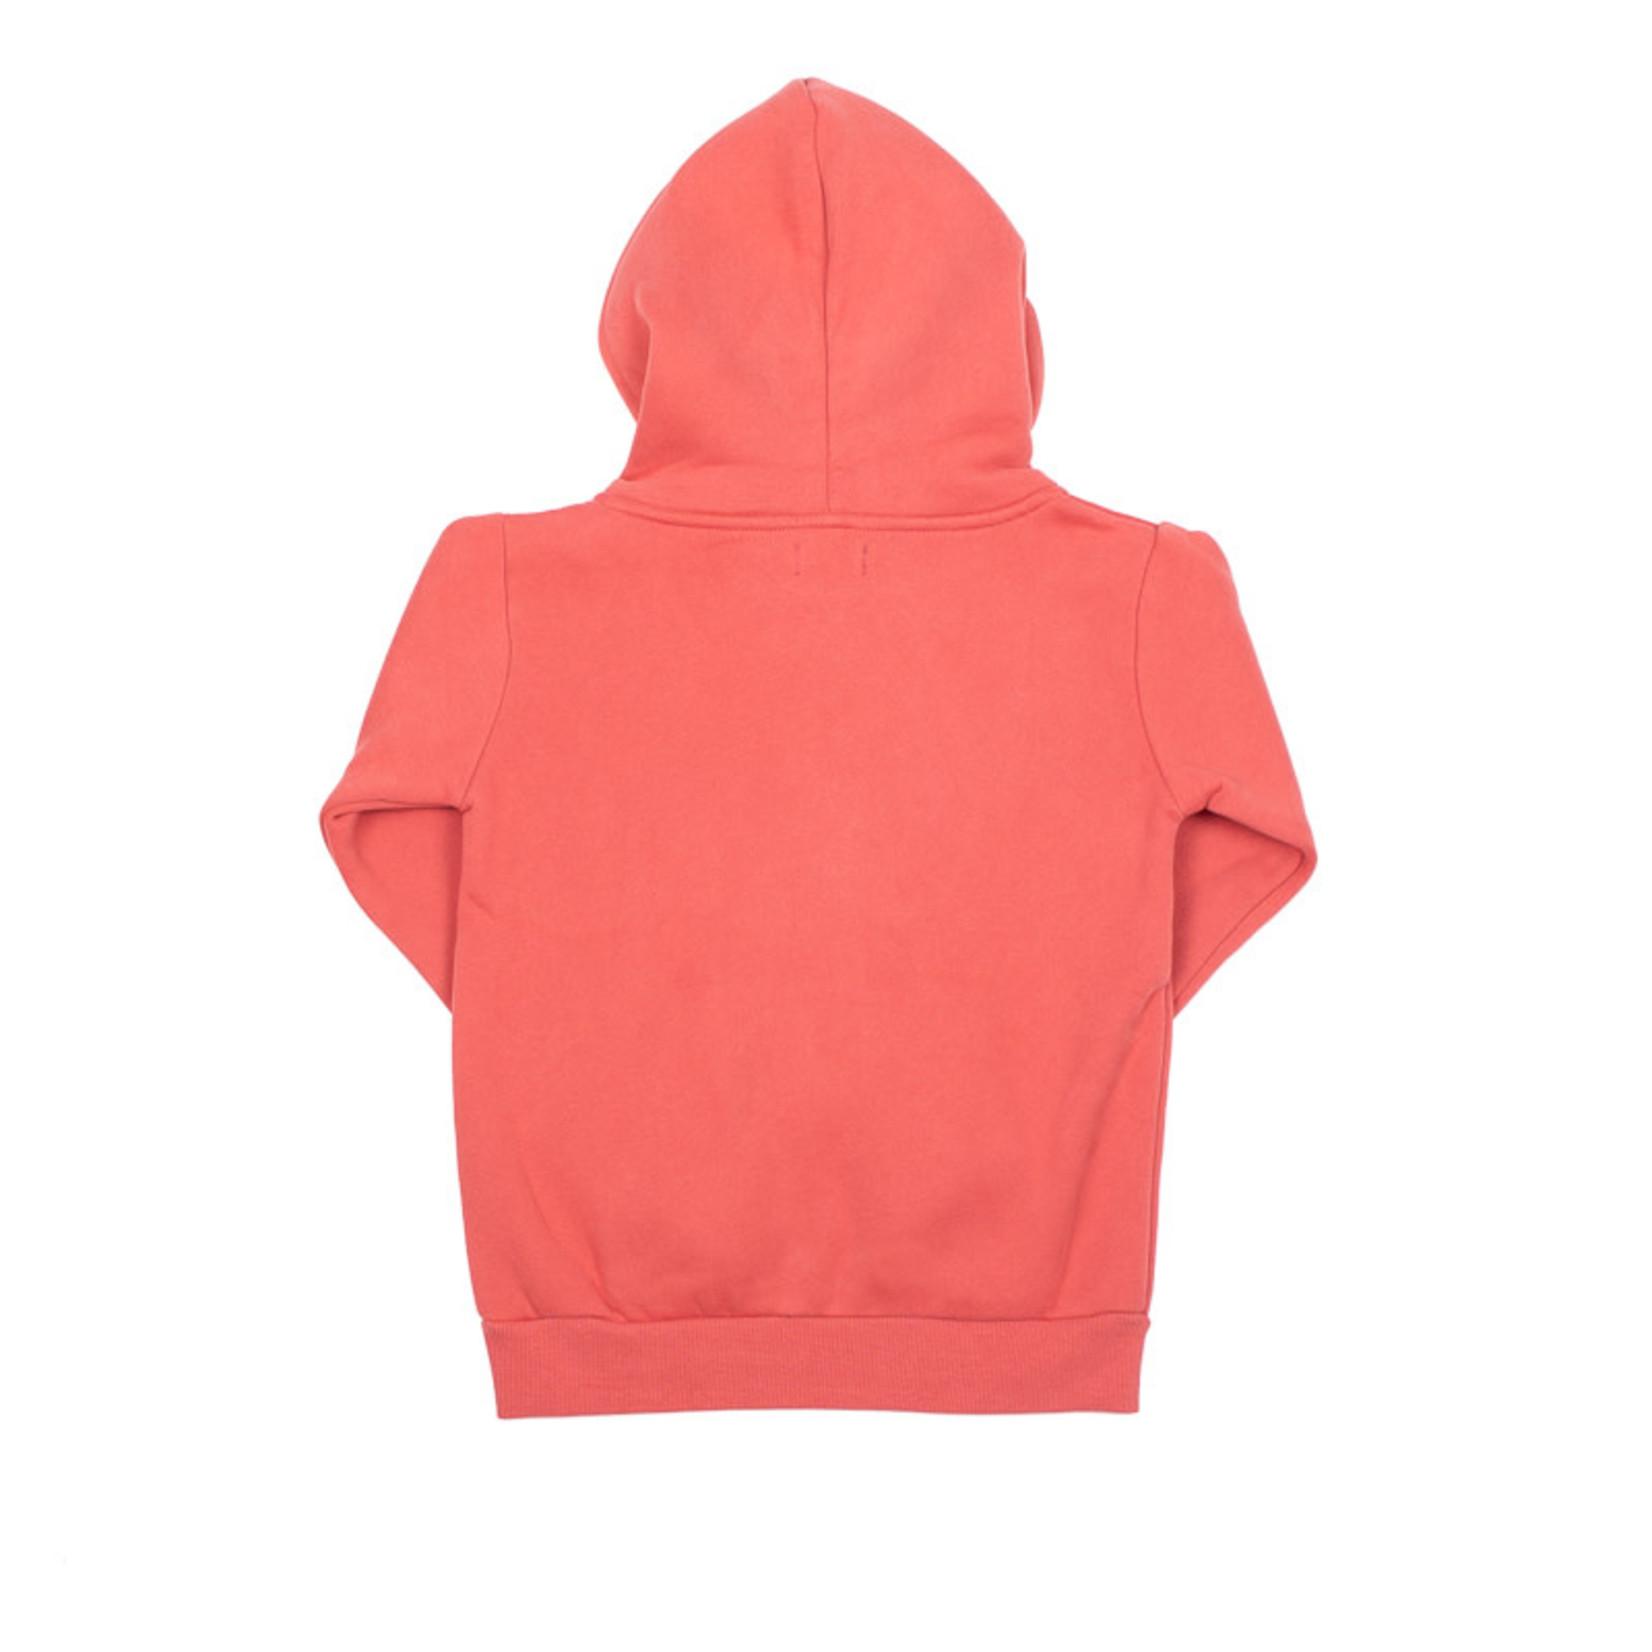 WLKN WLKN : Girl Junior Basic Zip-Up Hoodie